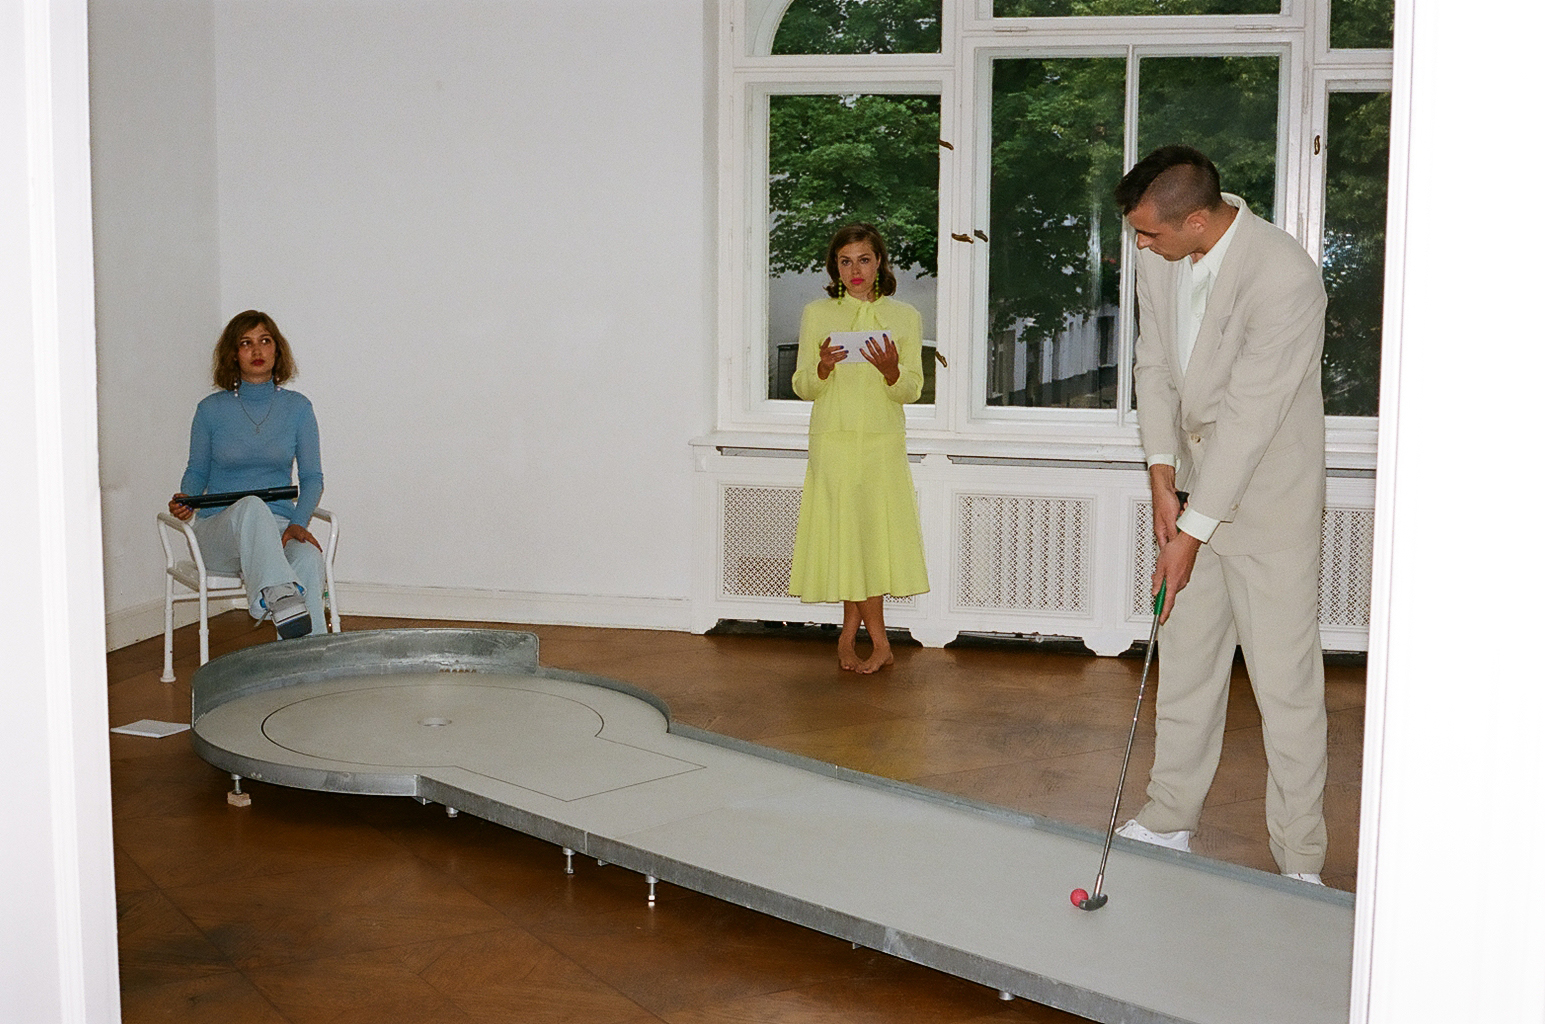 Saisoneröffnung: Performance Olga Hohmann, Lea Hopp und Lukas Kesler Fotos: Amelie Amei Kahn-Ackermann